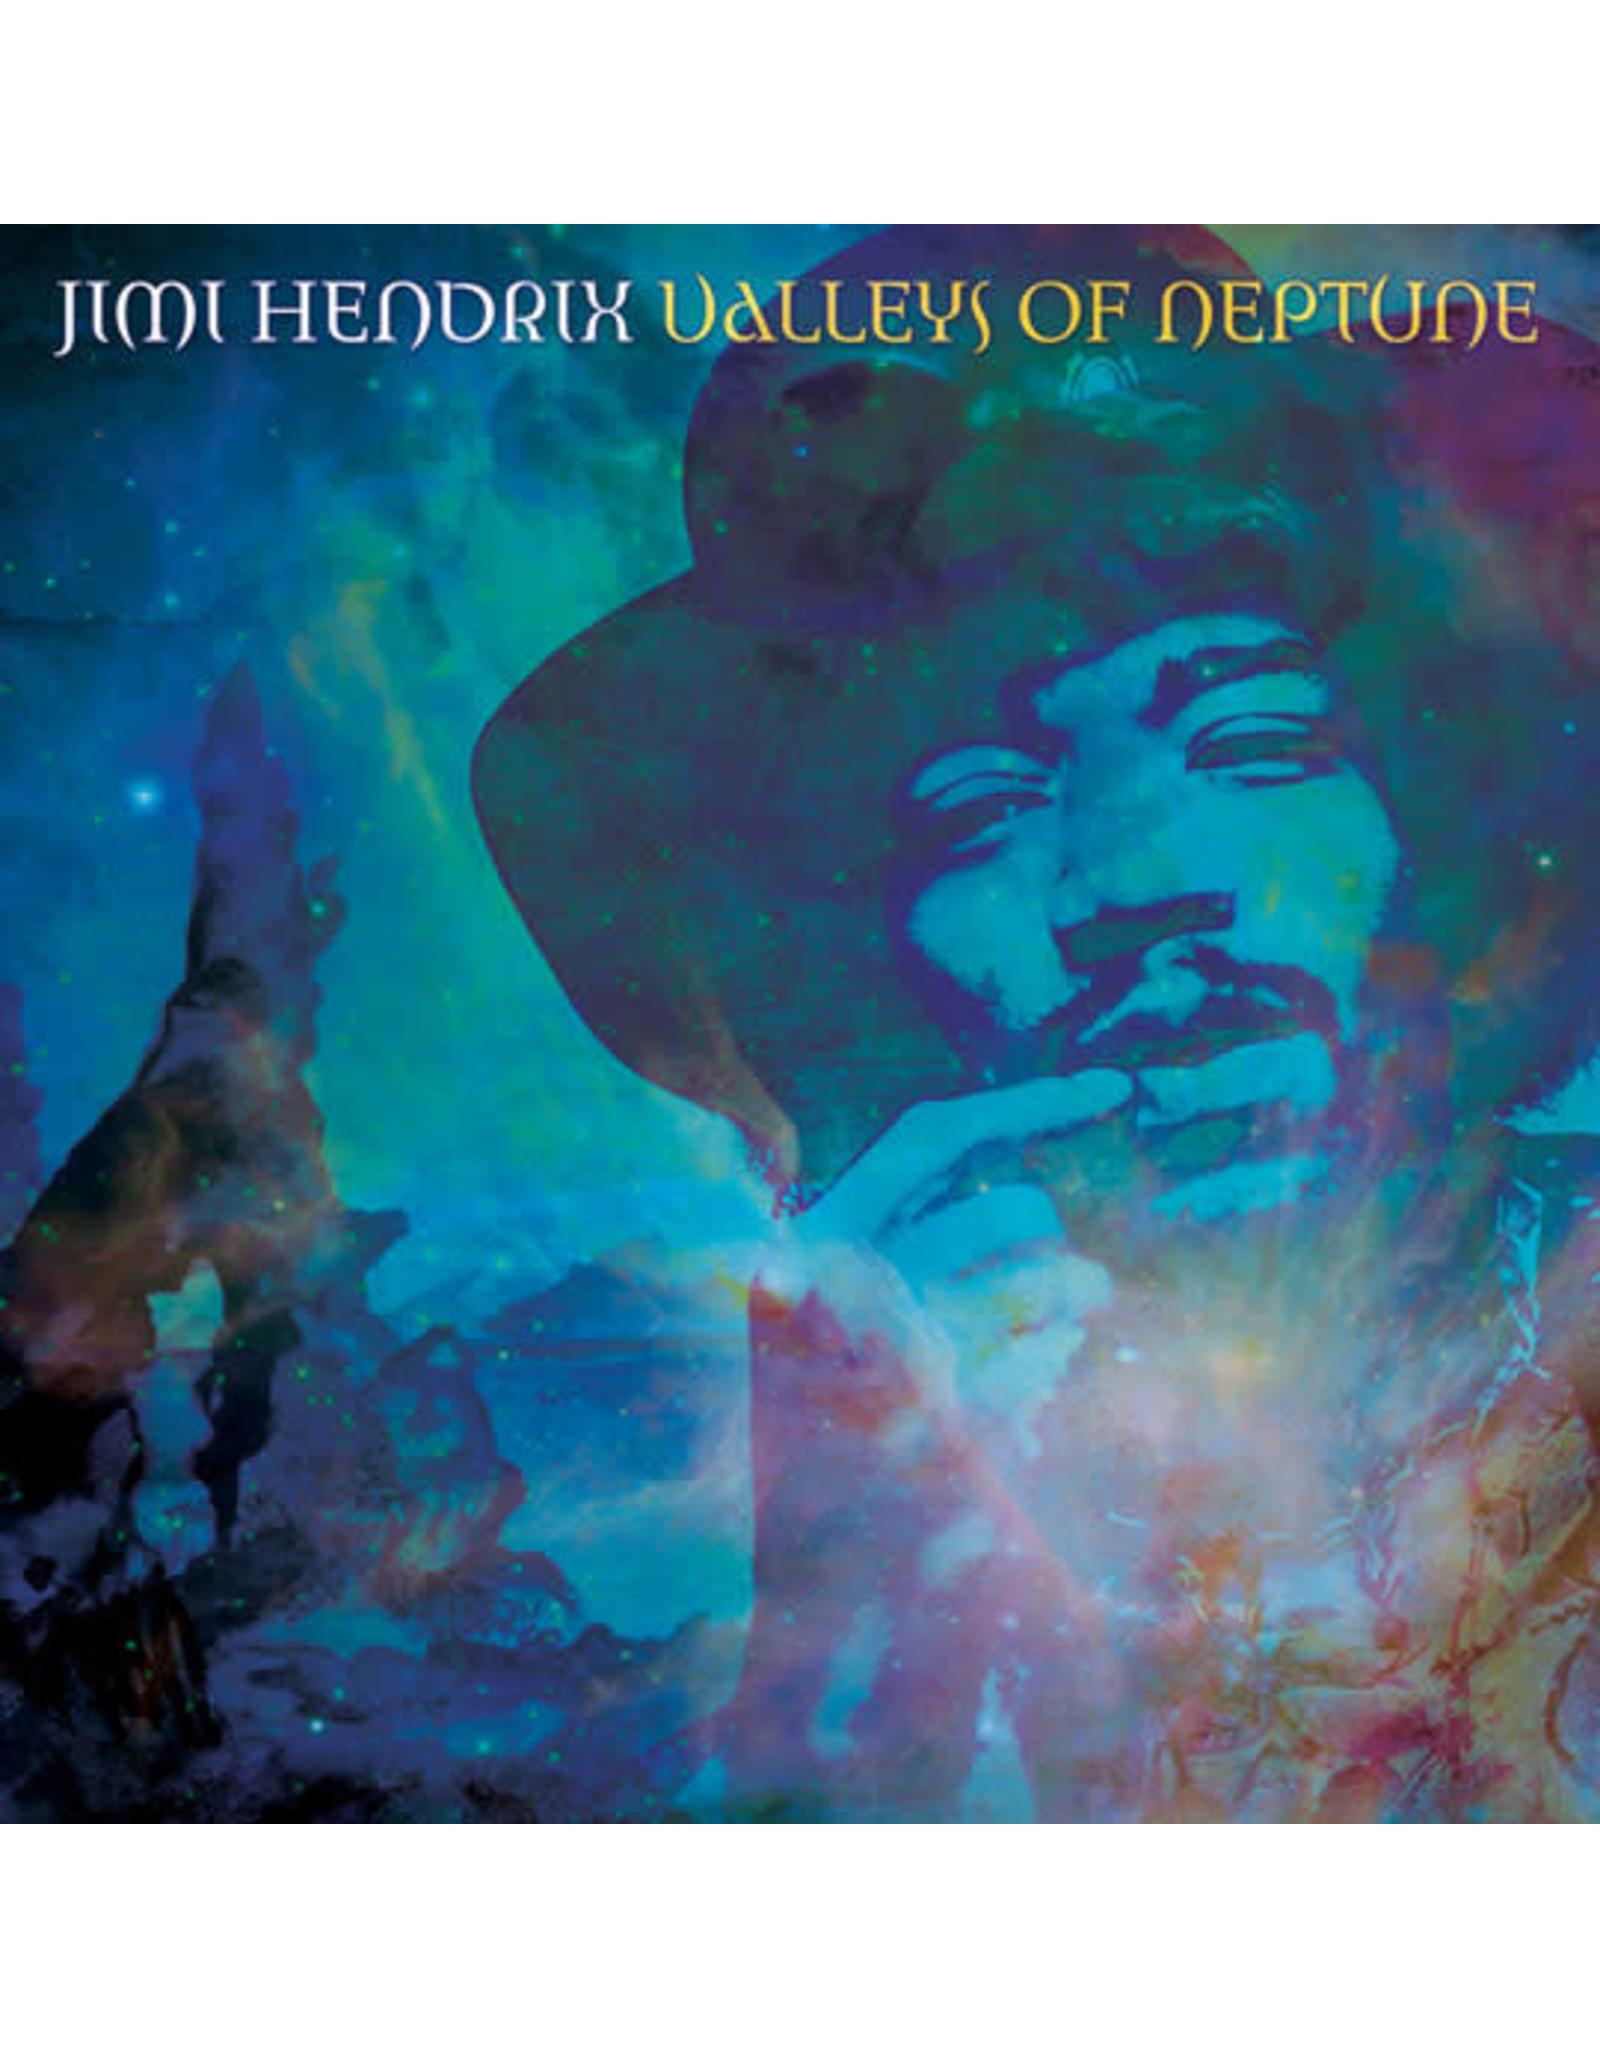 Vinyl Jimi Hendrix - Valleys Of Neptune